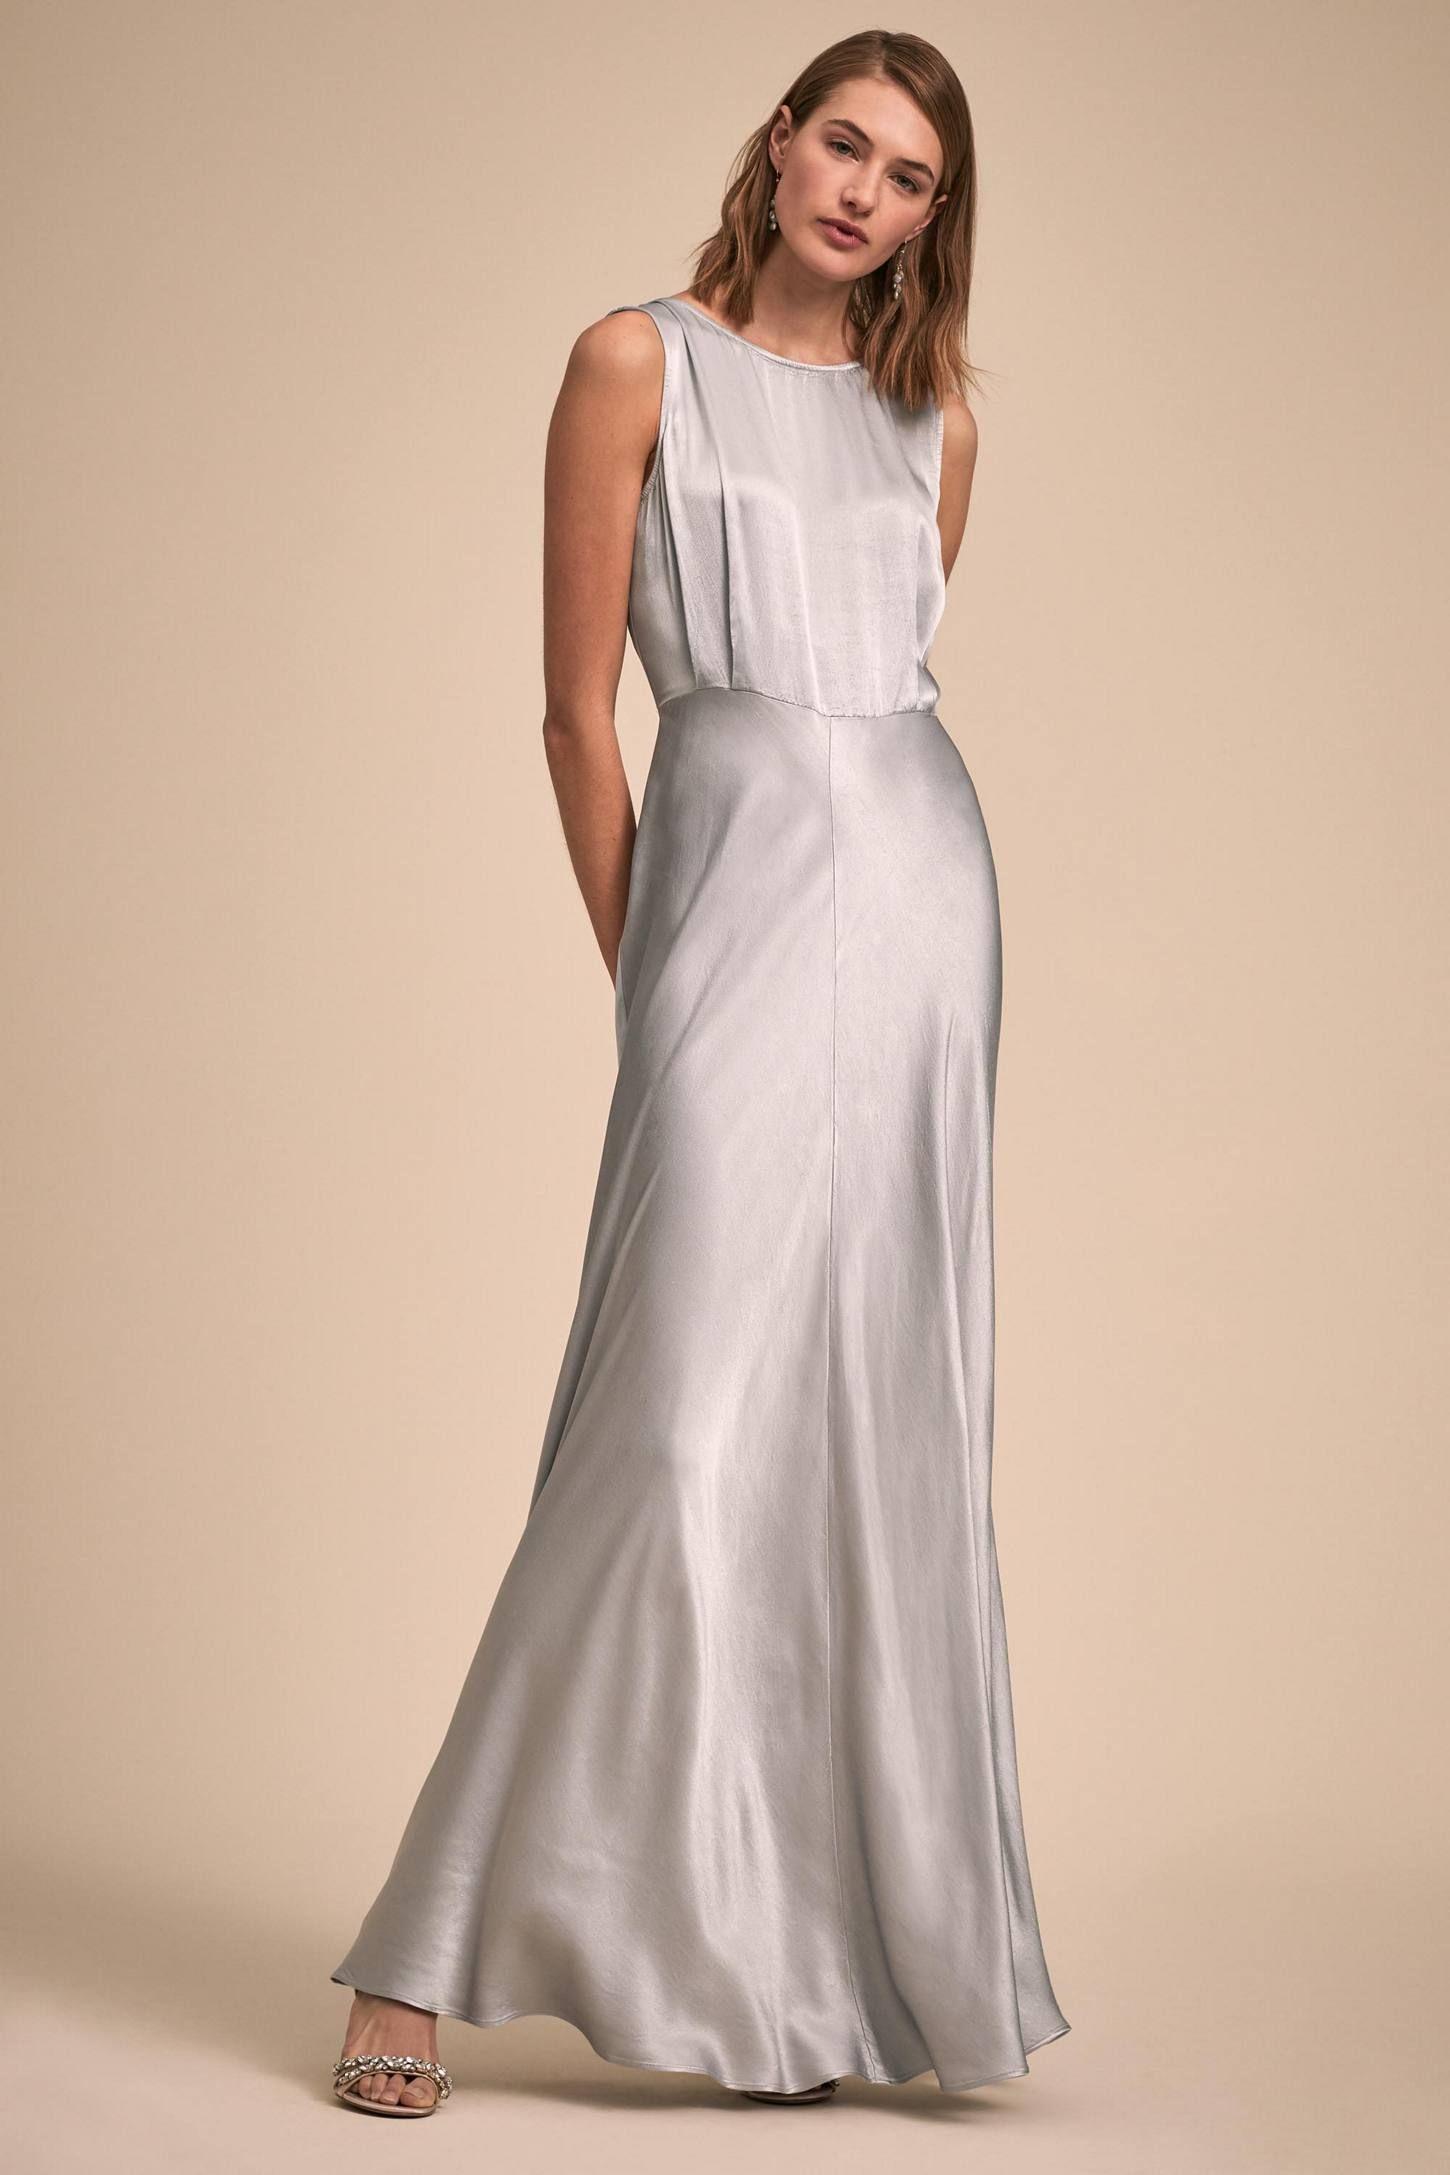 Evening Dresses For Weddings Ireland